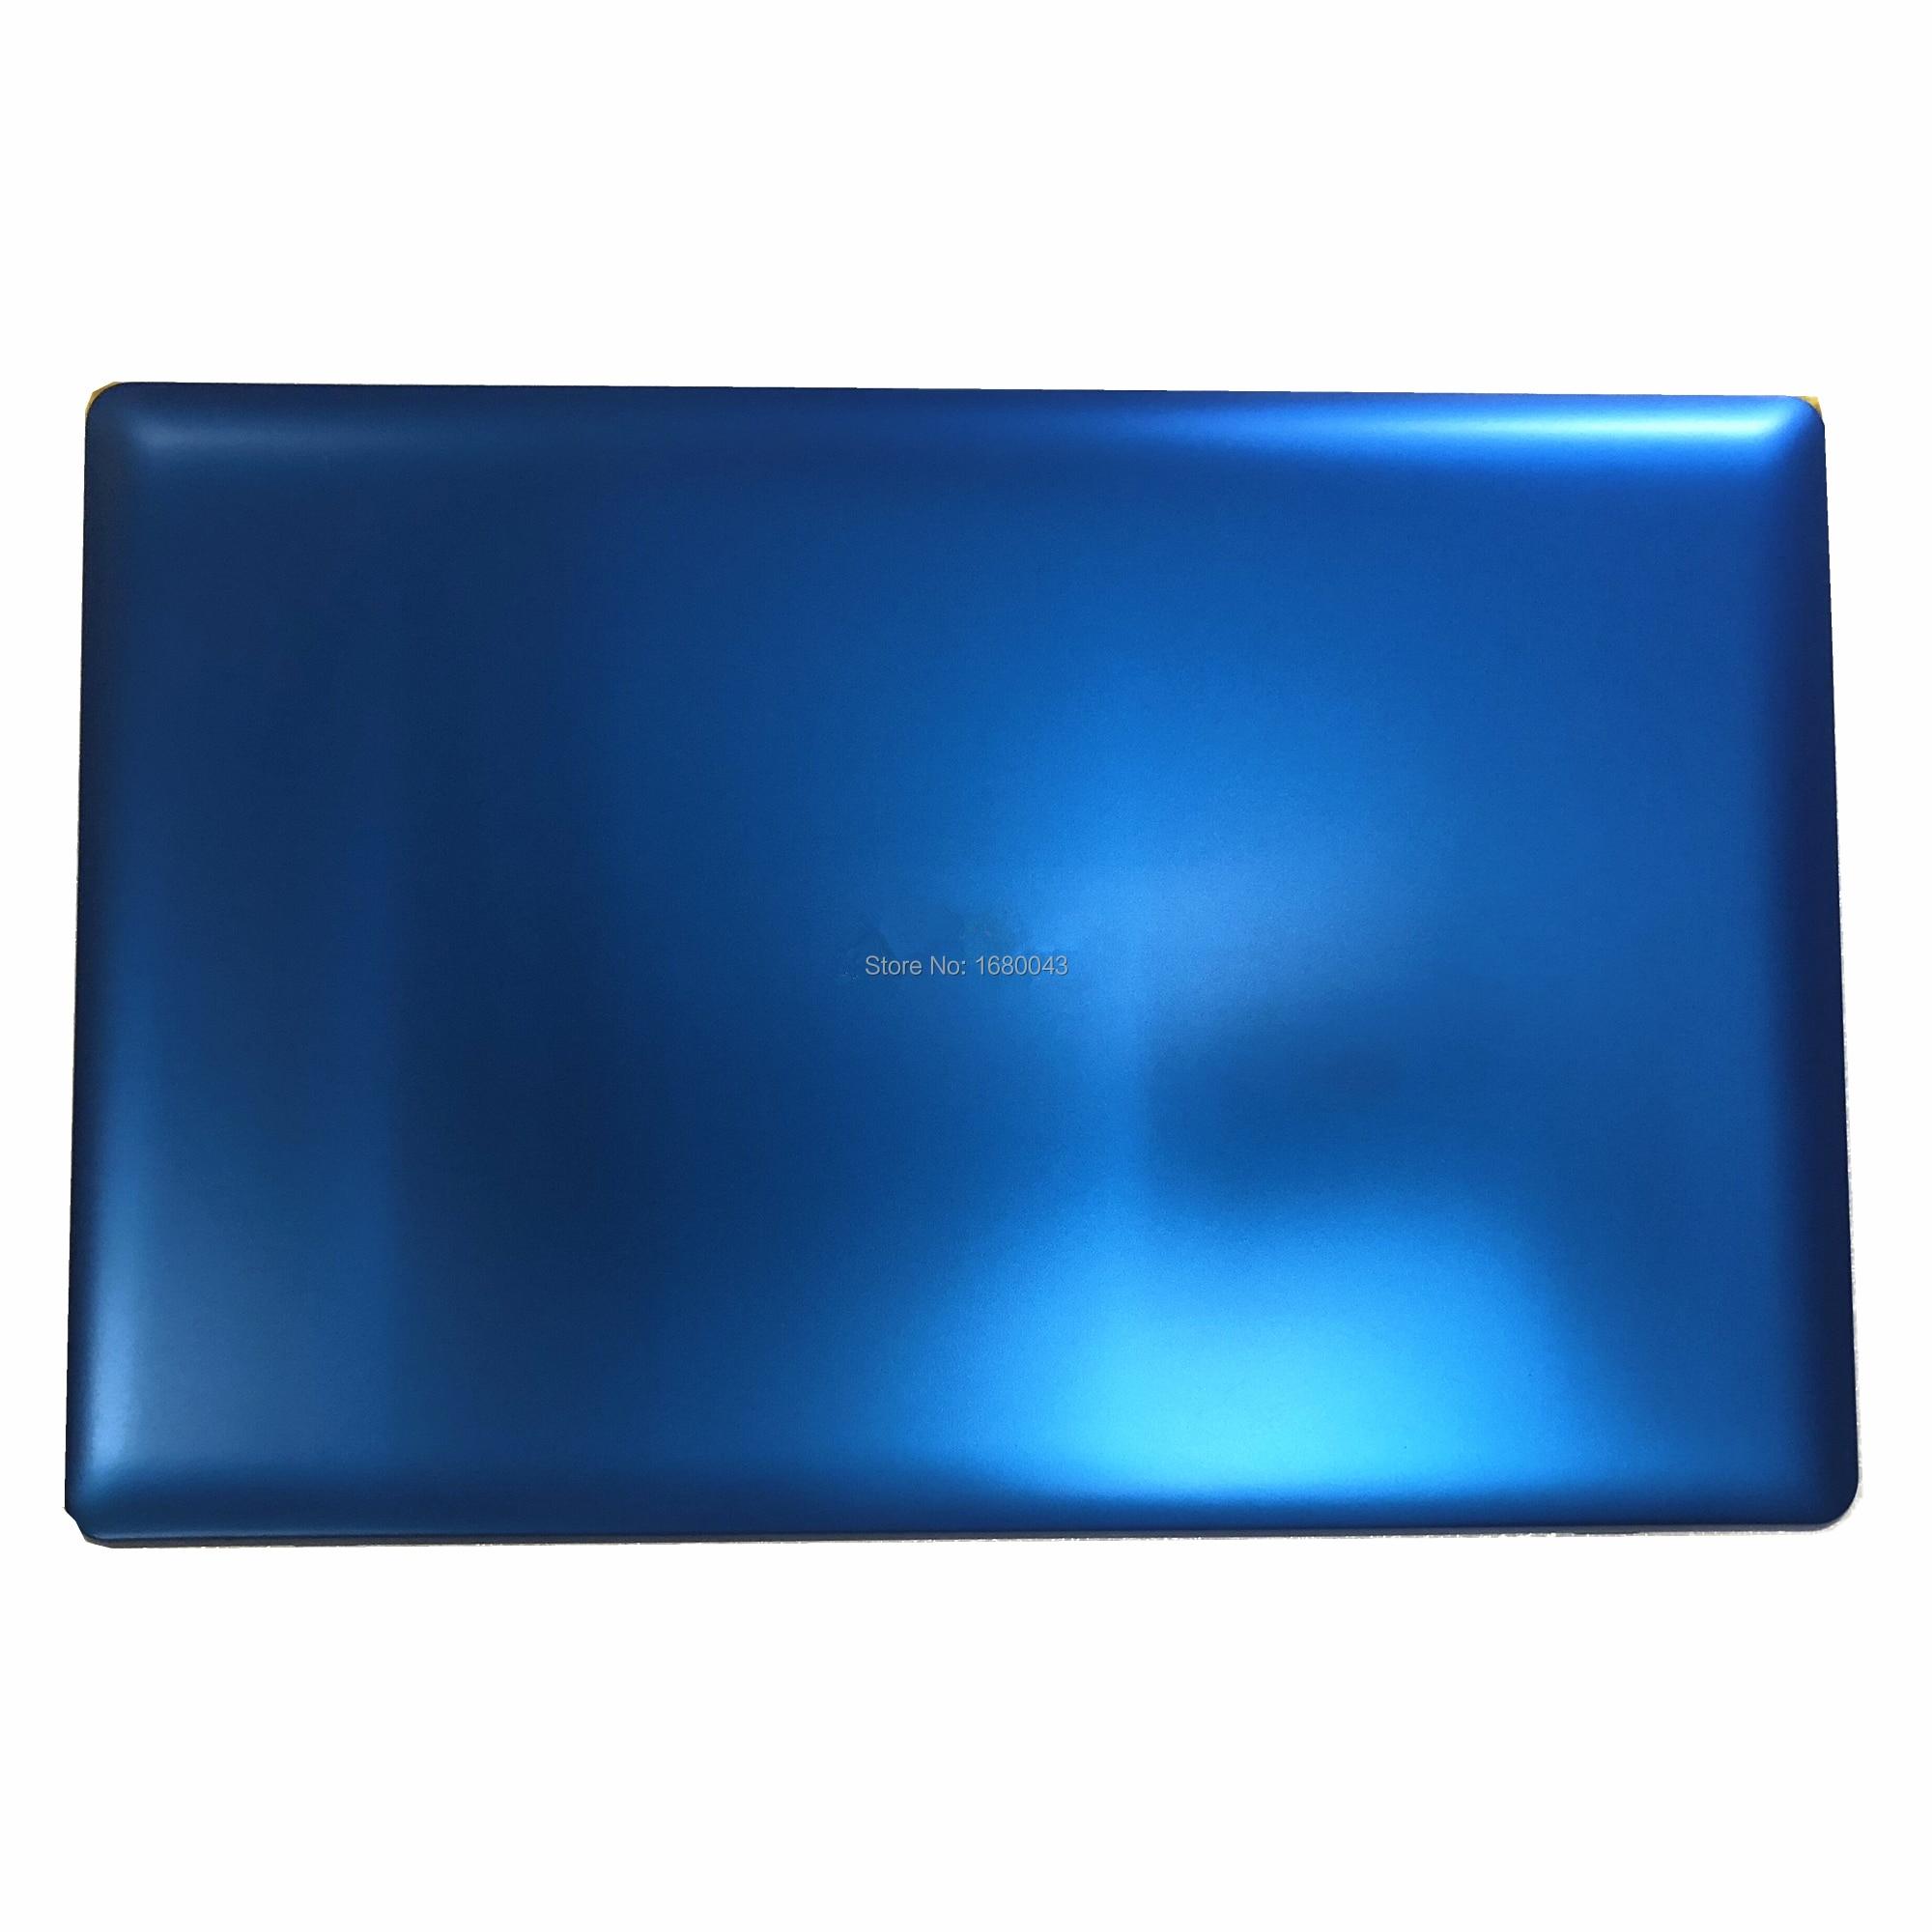 LCD pantalla LED MONTAJE DE digitalizador con pantalla táctil de vidrio carcasa azul con marco de piezas de repuesto para Asus Vivobook X200CA X200MA